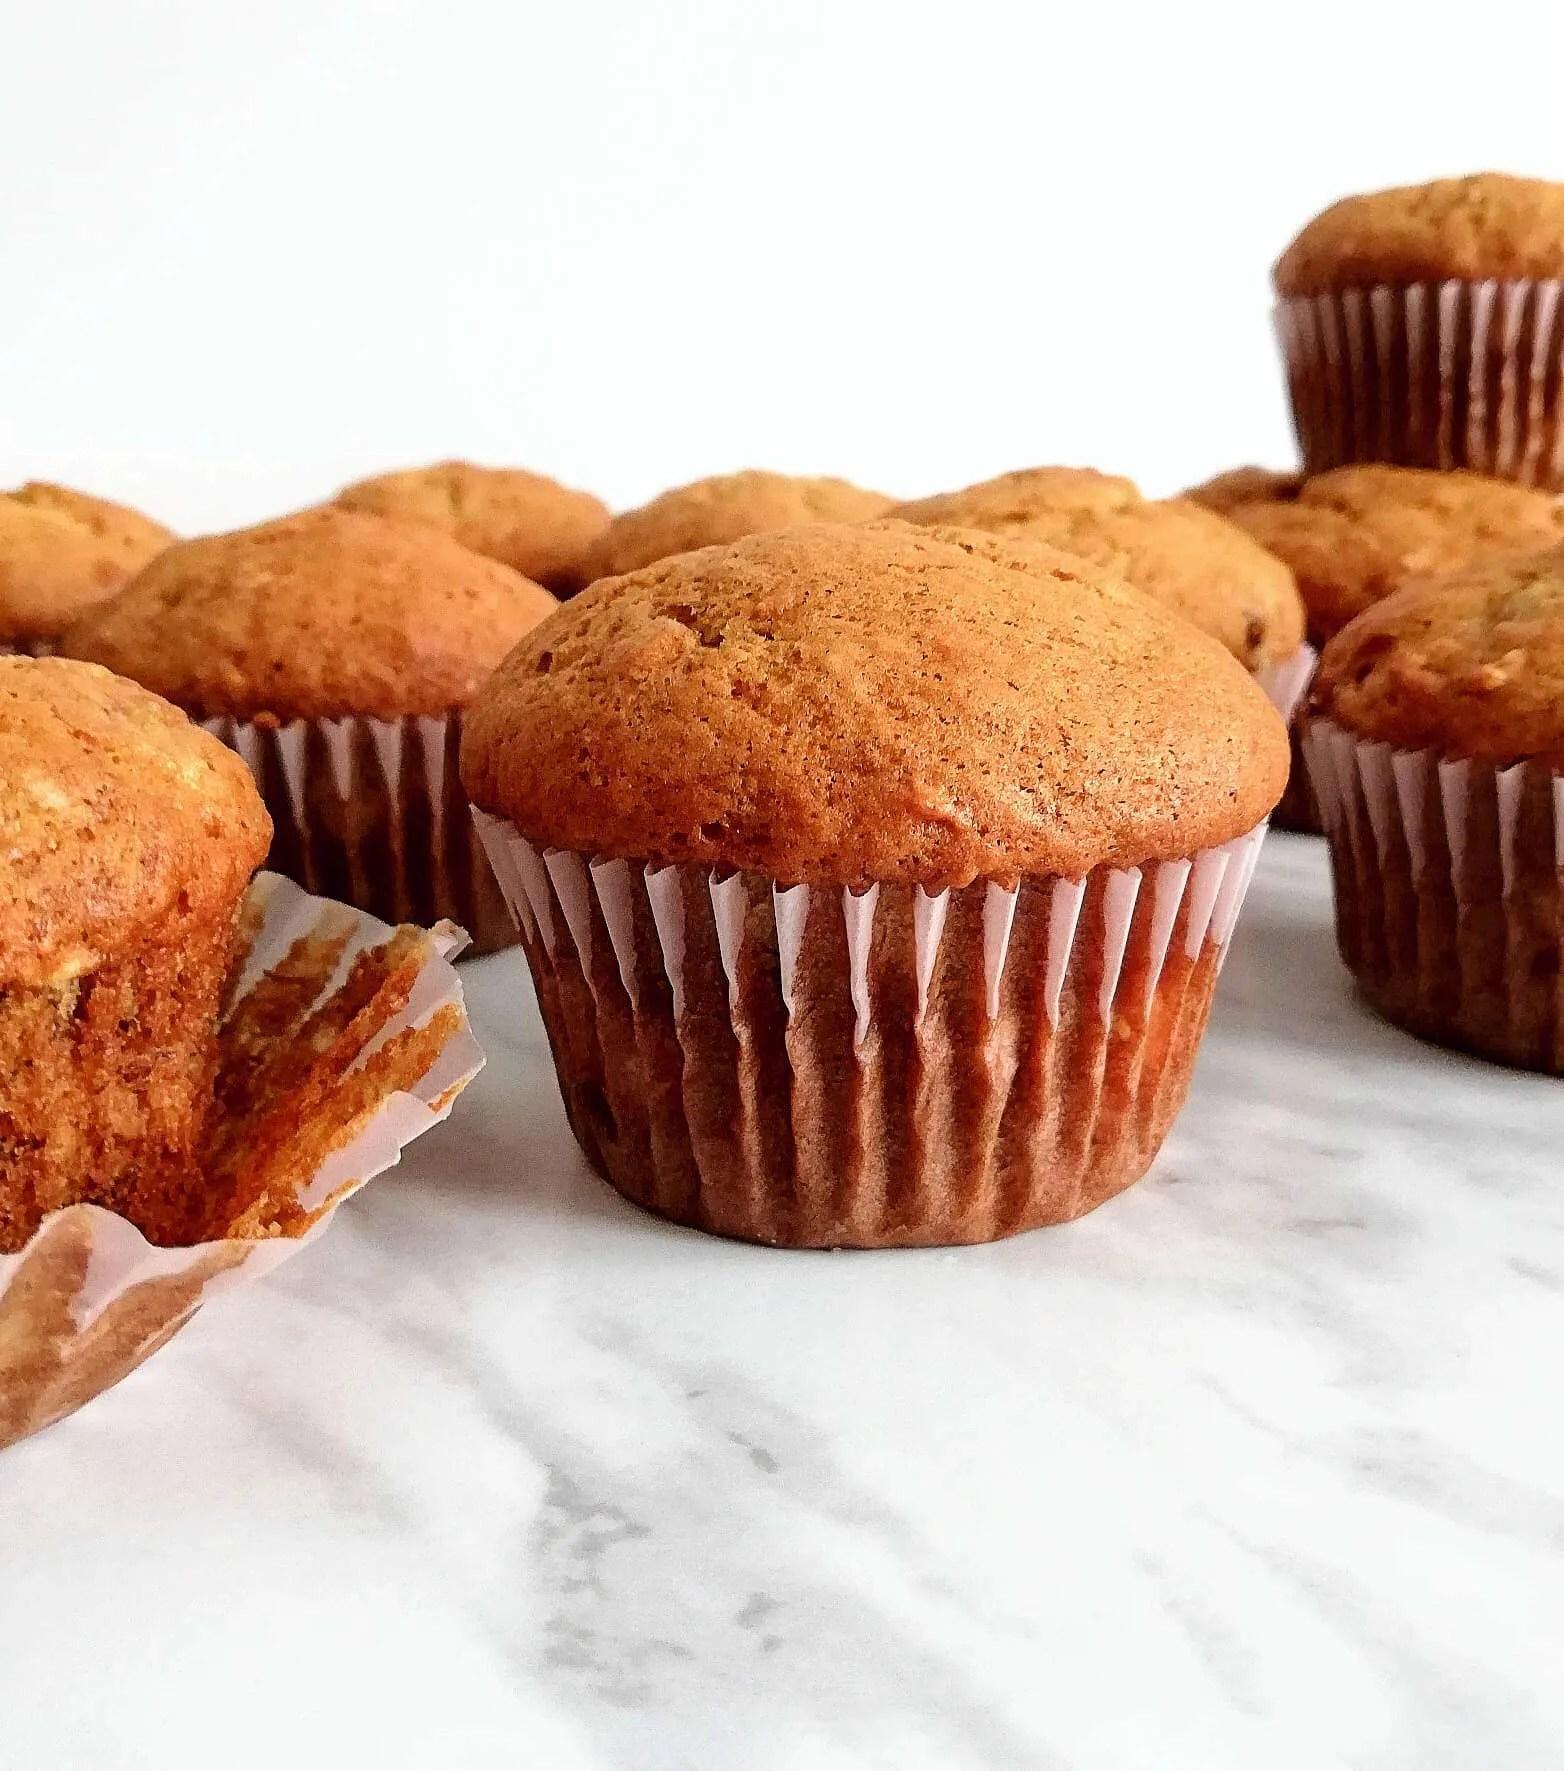 banana muffins side view 2